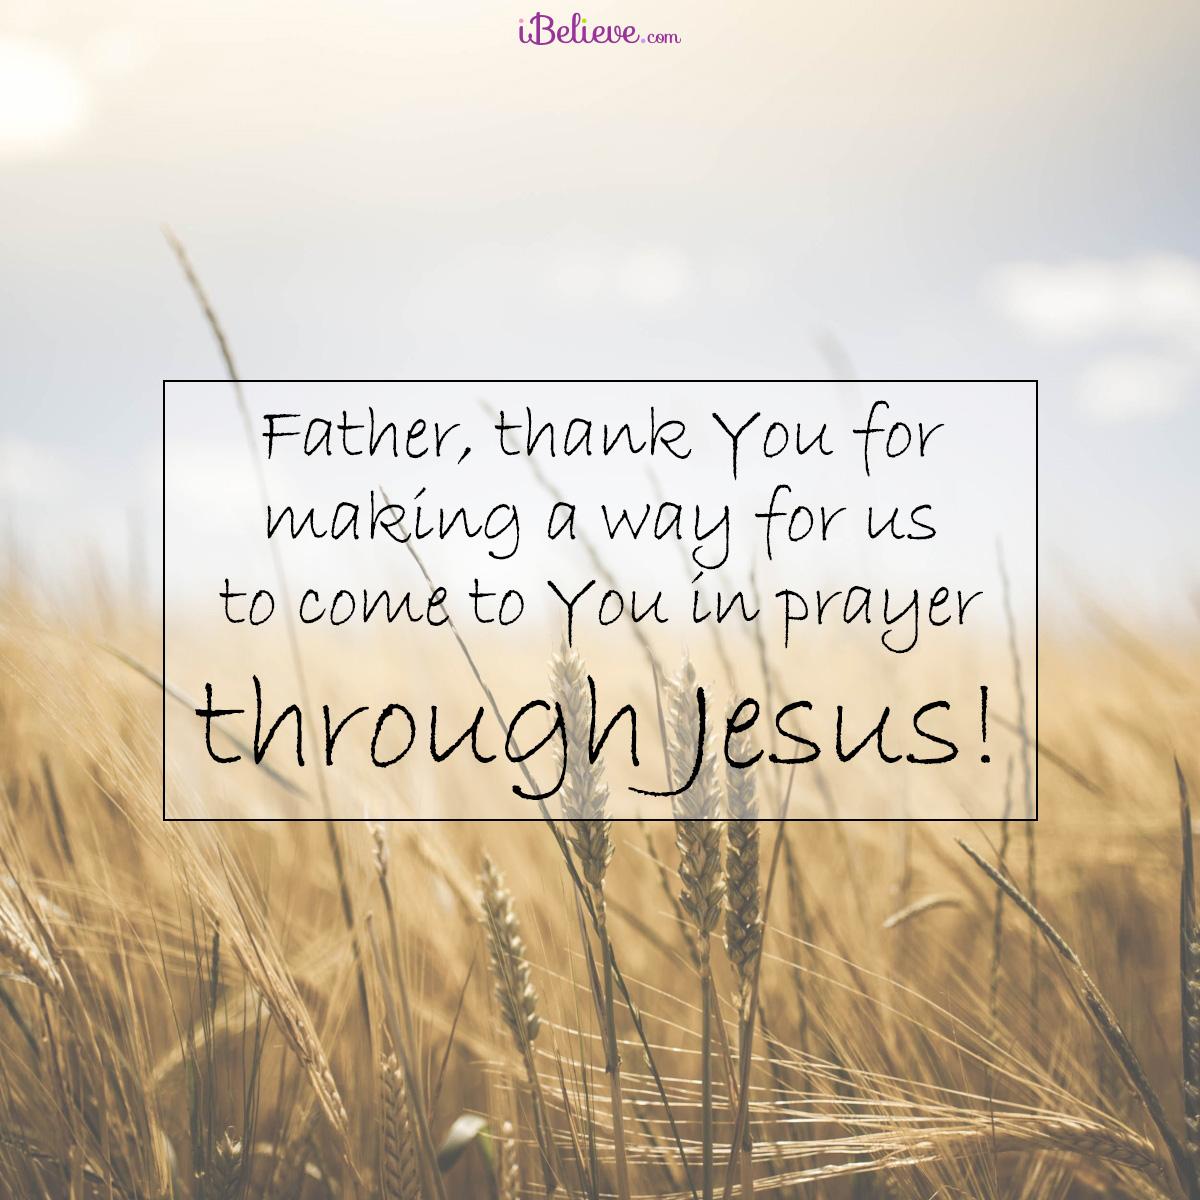 through Jesus, inspirational image